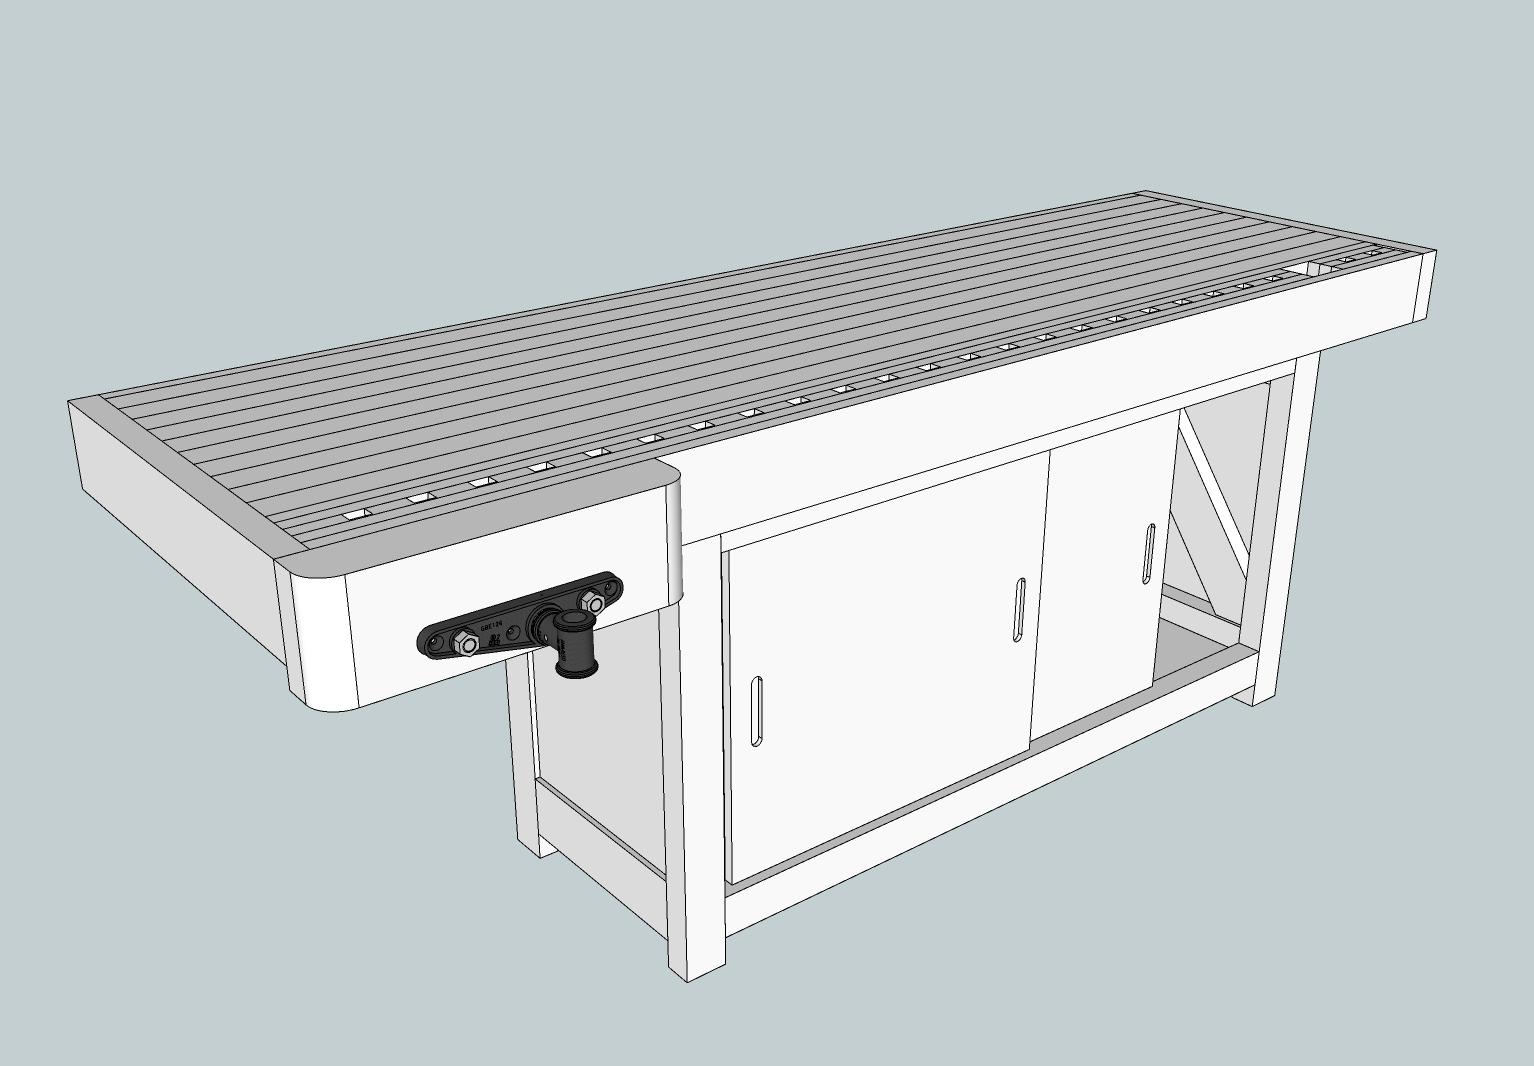 Le bois a vince tabli virtuel - Construction etabli en bois ...